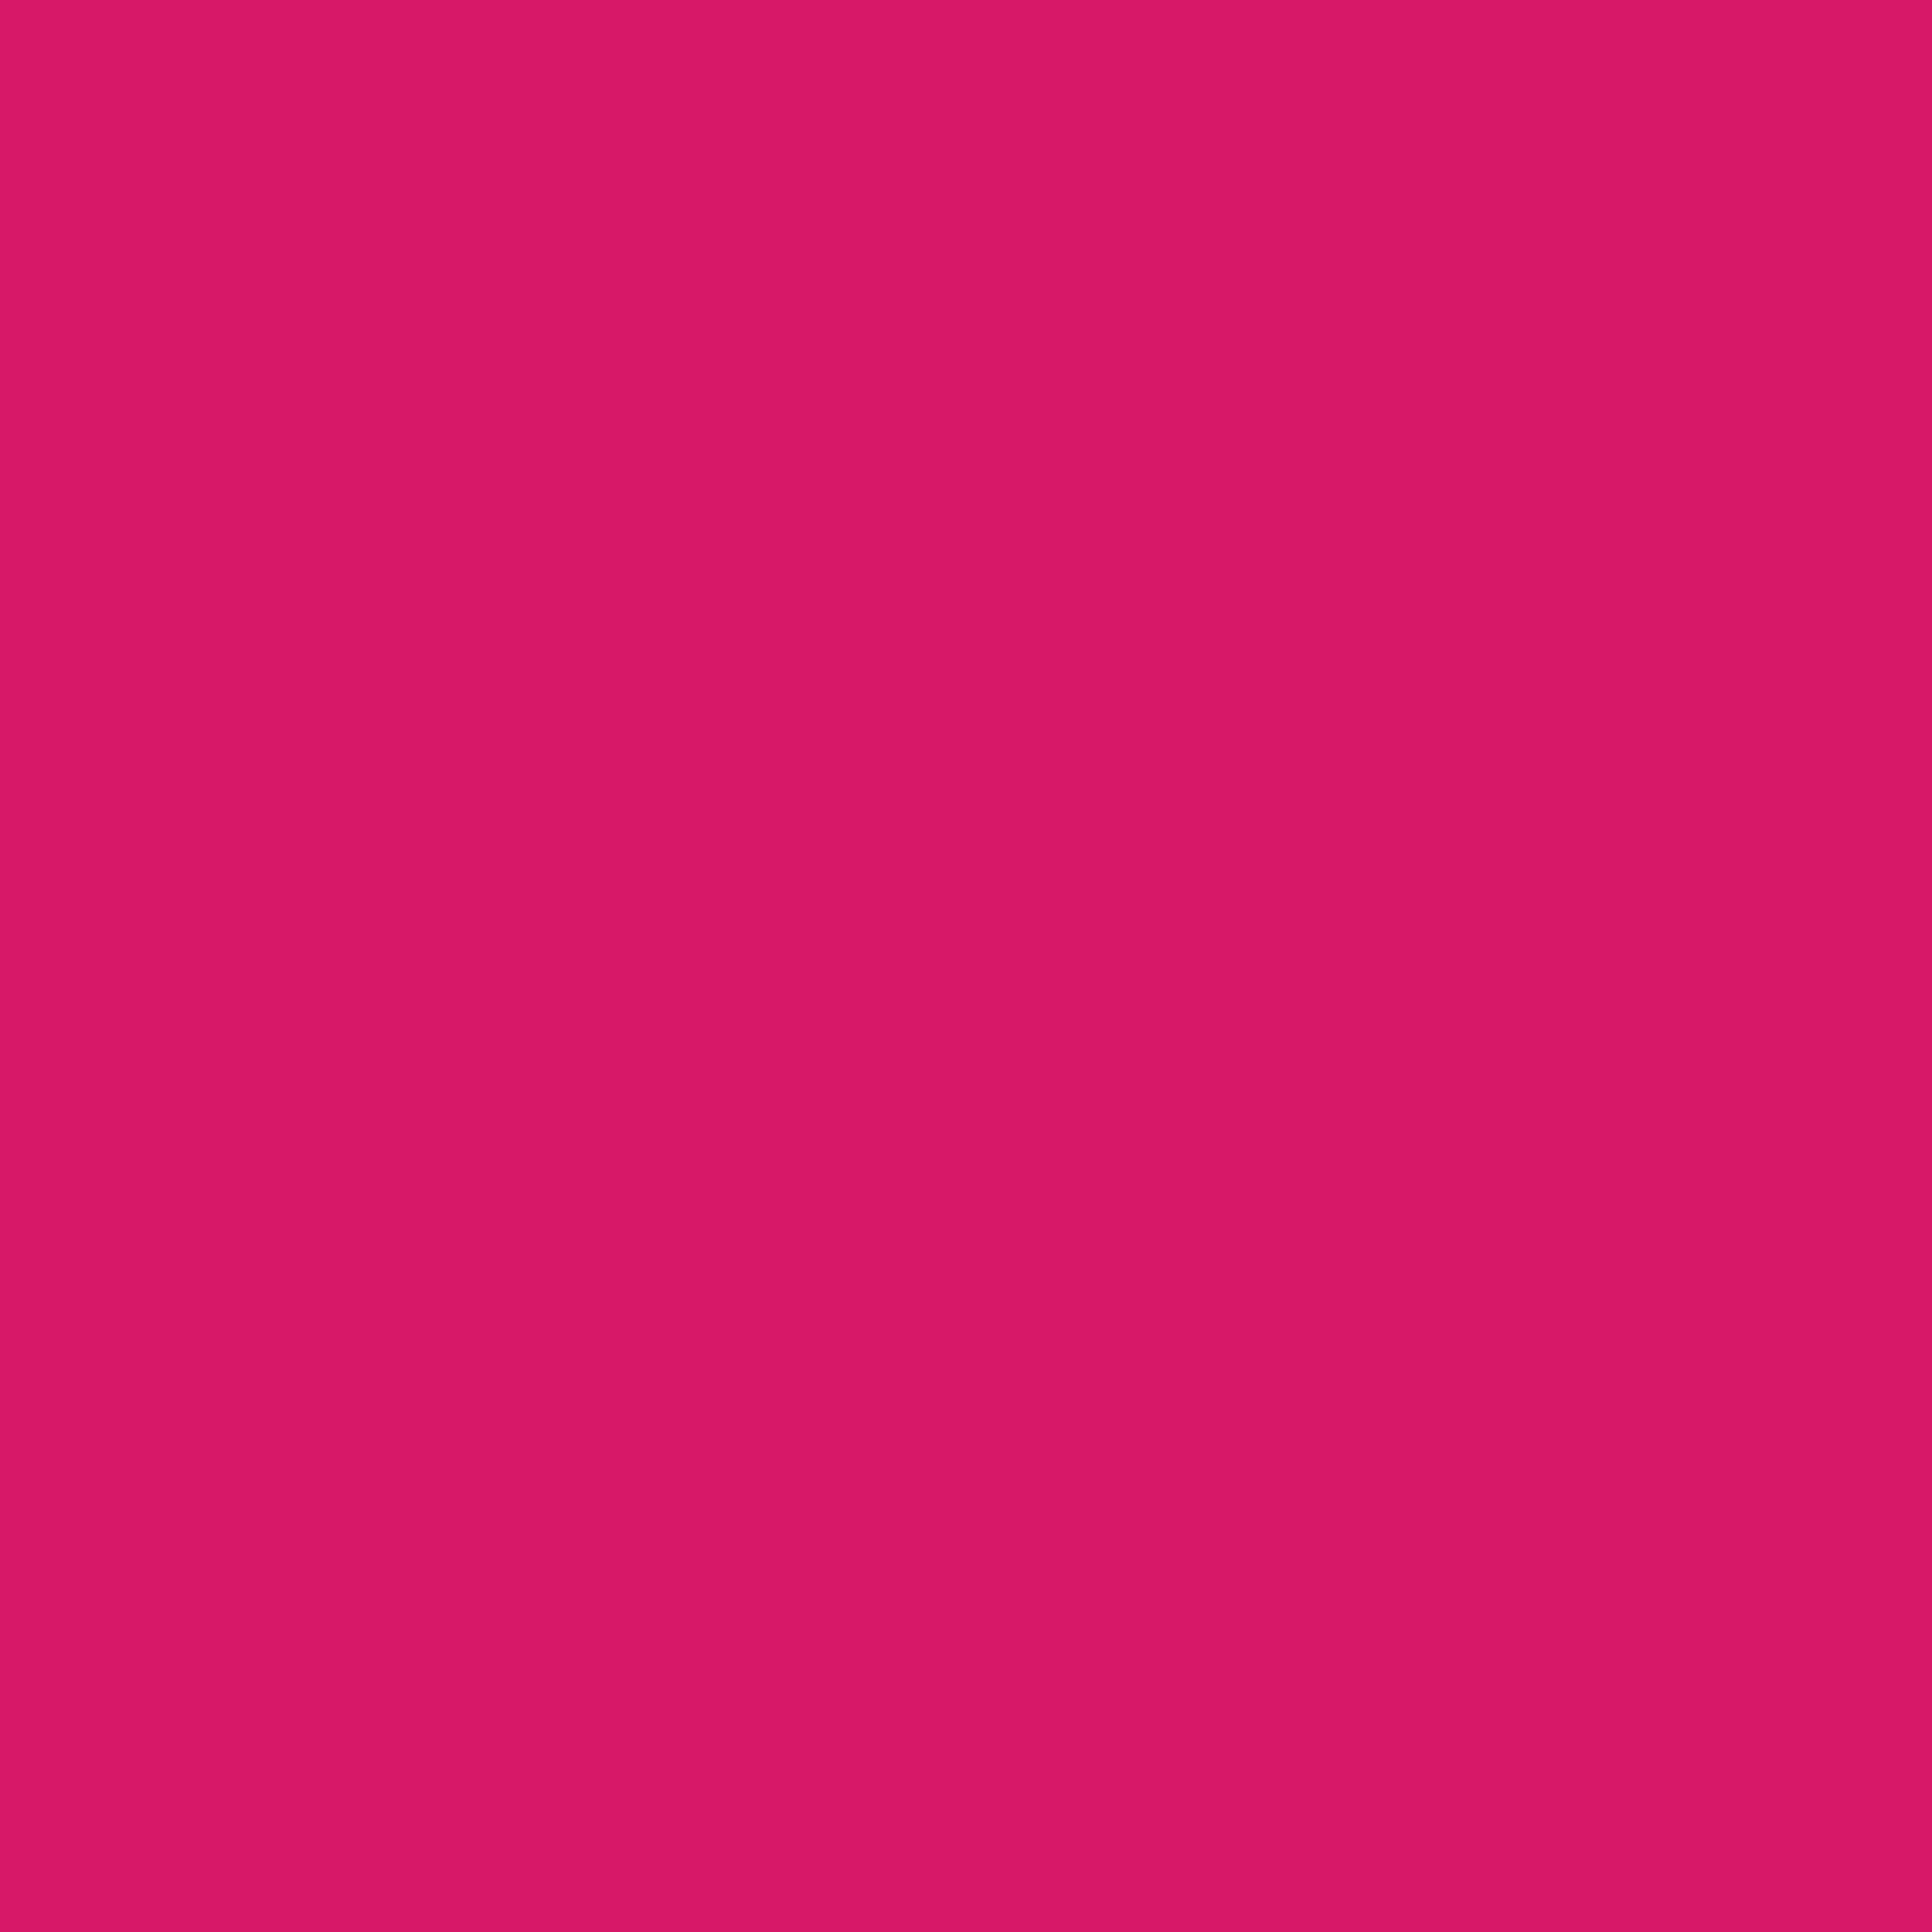 2048x2048 Dogwood Rose Solid Color Background